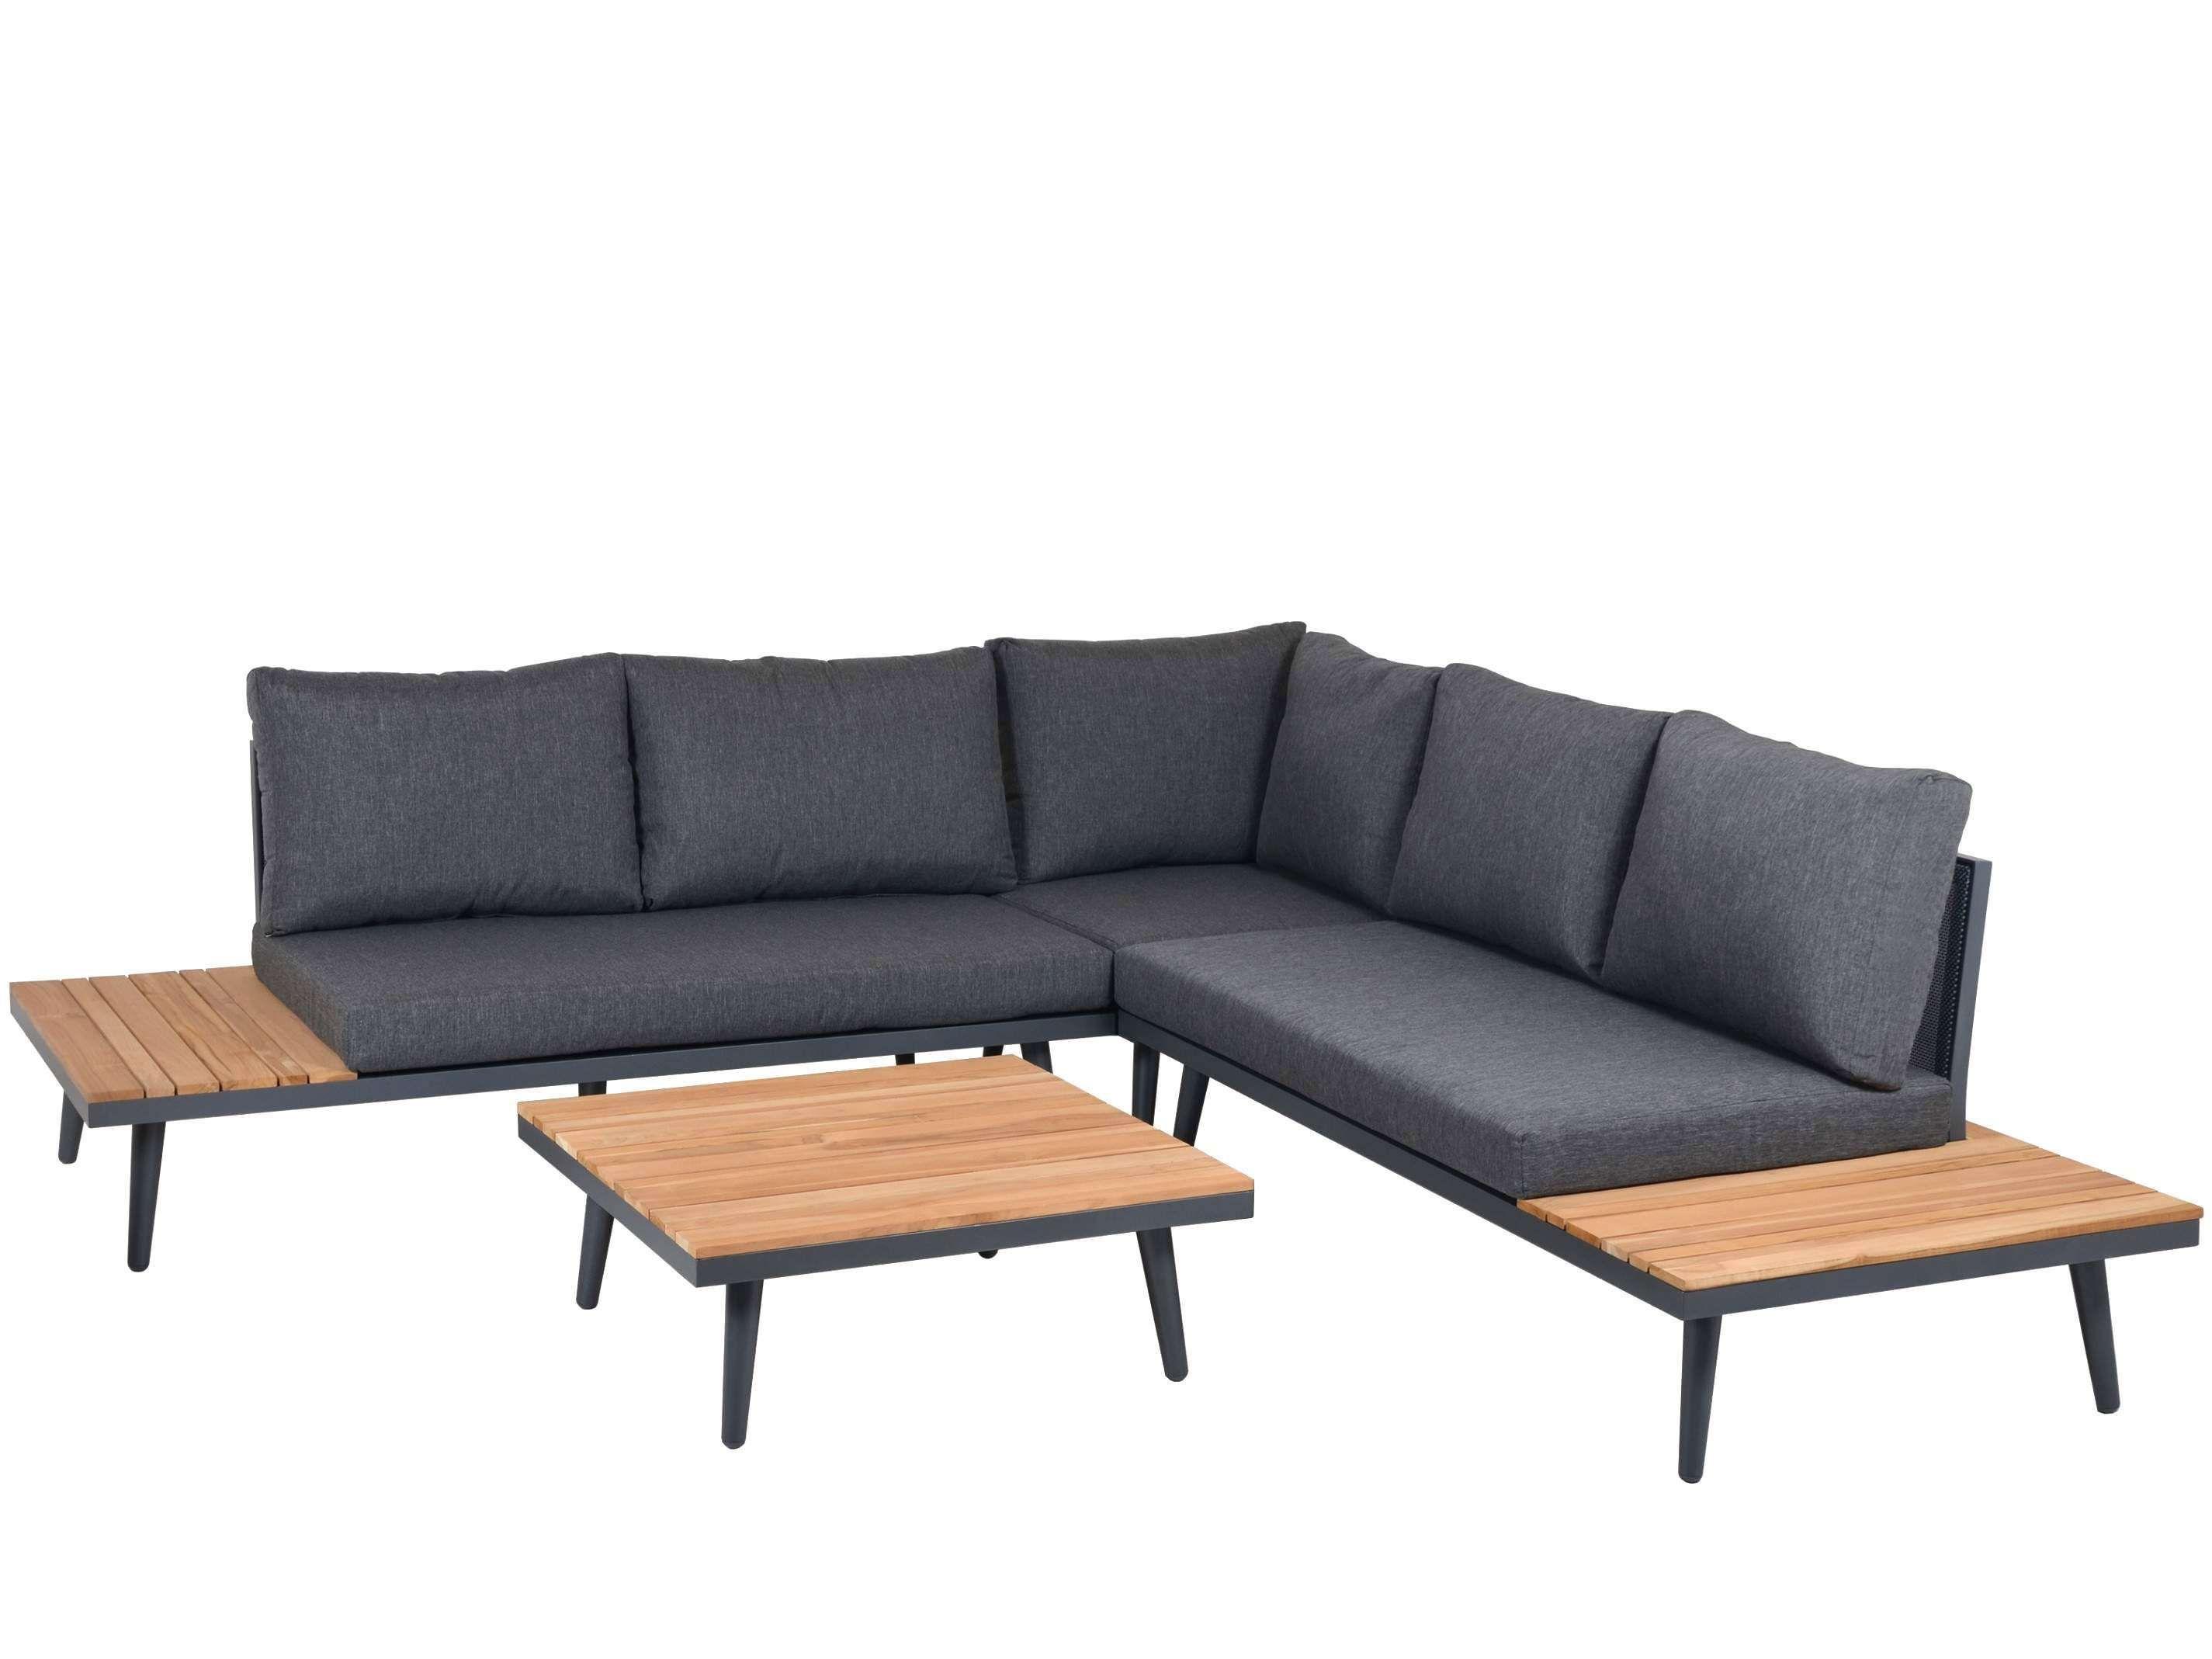 Lounge Sofa Terrasse Terrasse Anlegen Tolle Terrasse Lounge Sofa